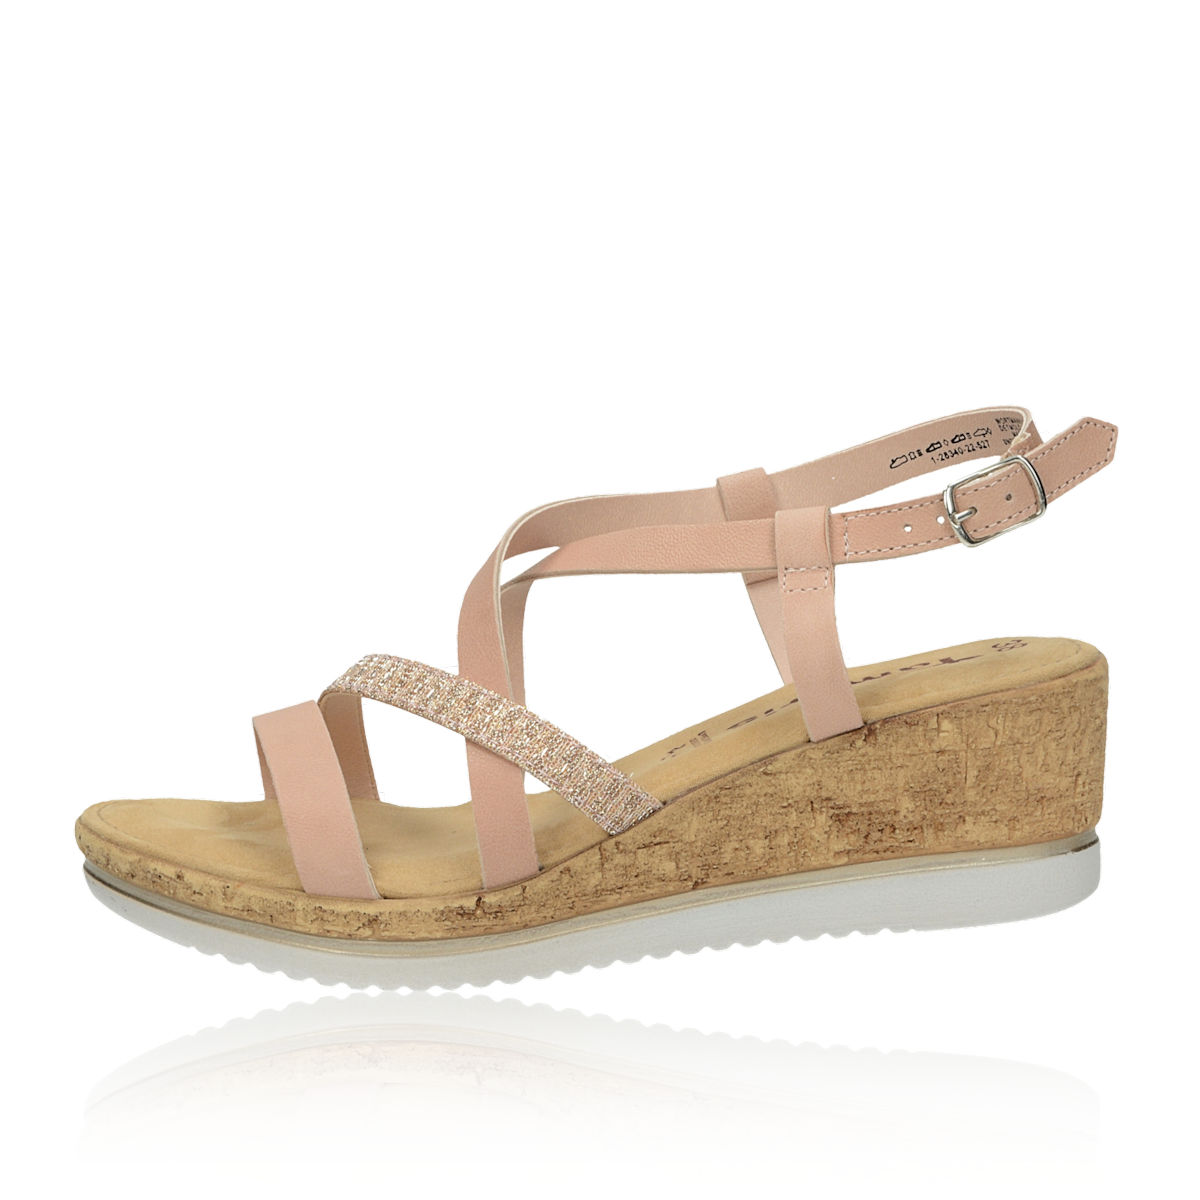 cb3cd514eb0b Tamaris dámske štýlové sandále - ružové Tamaris dámske štýlové sandále -  ružové ...